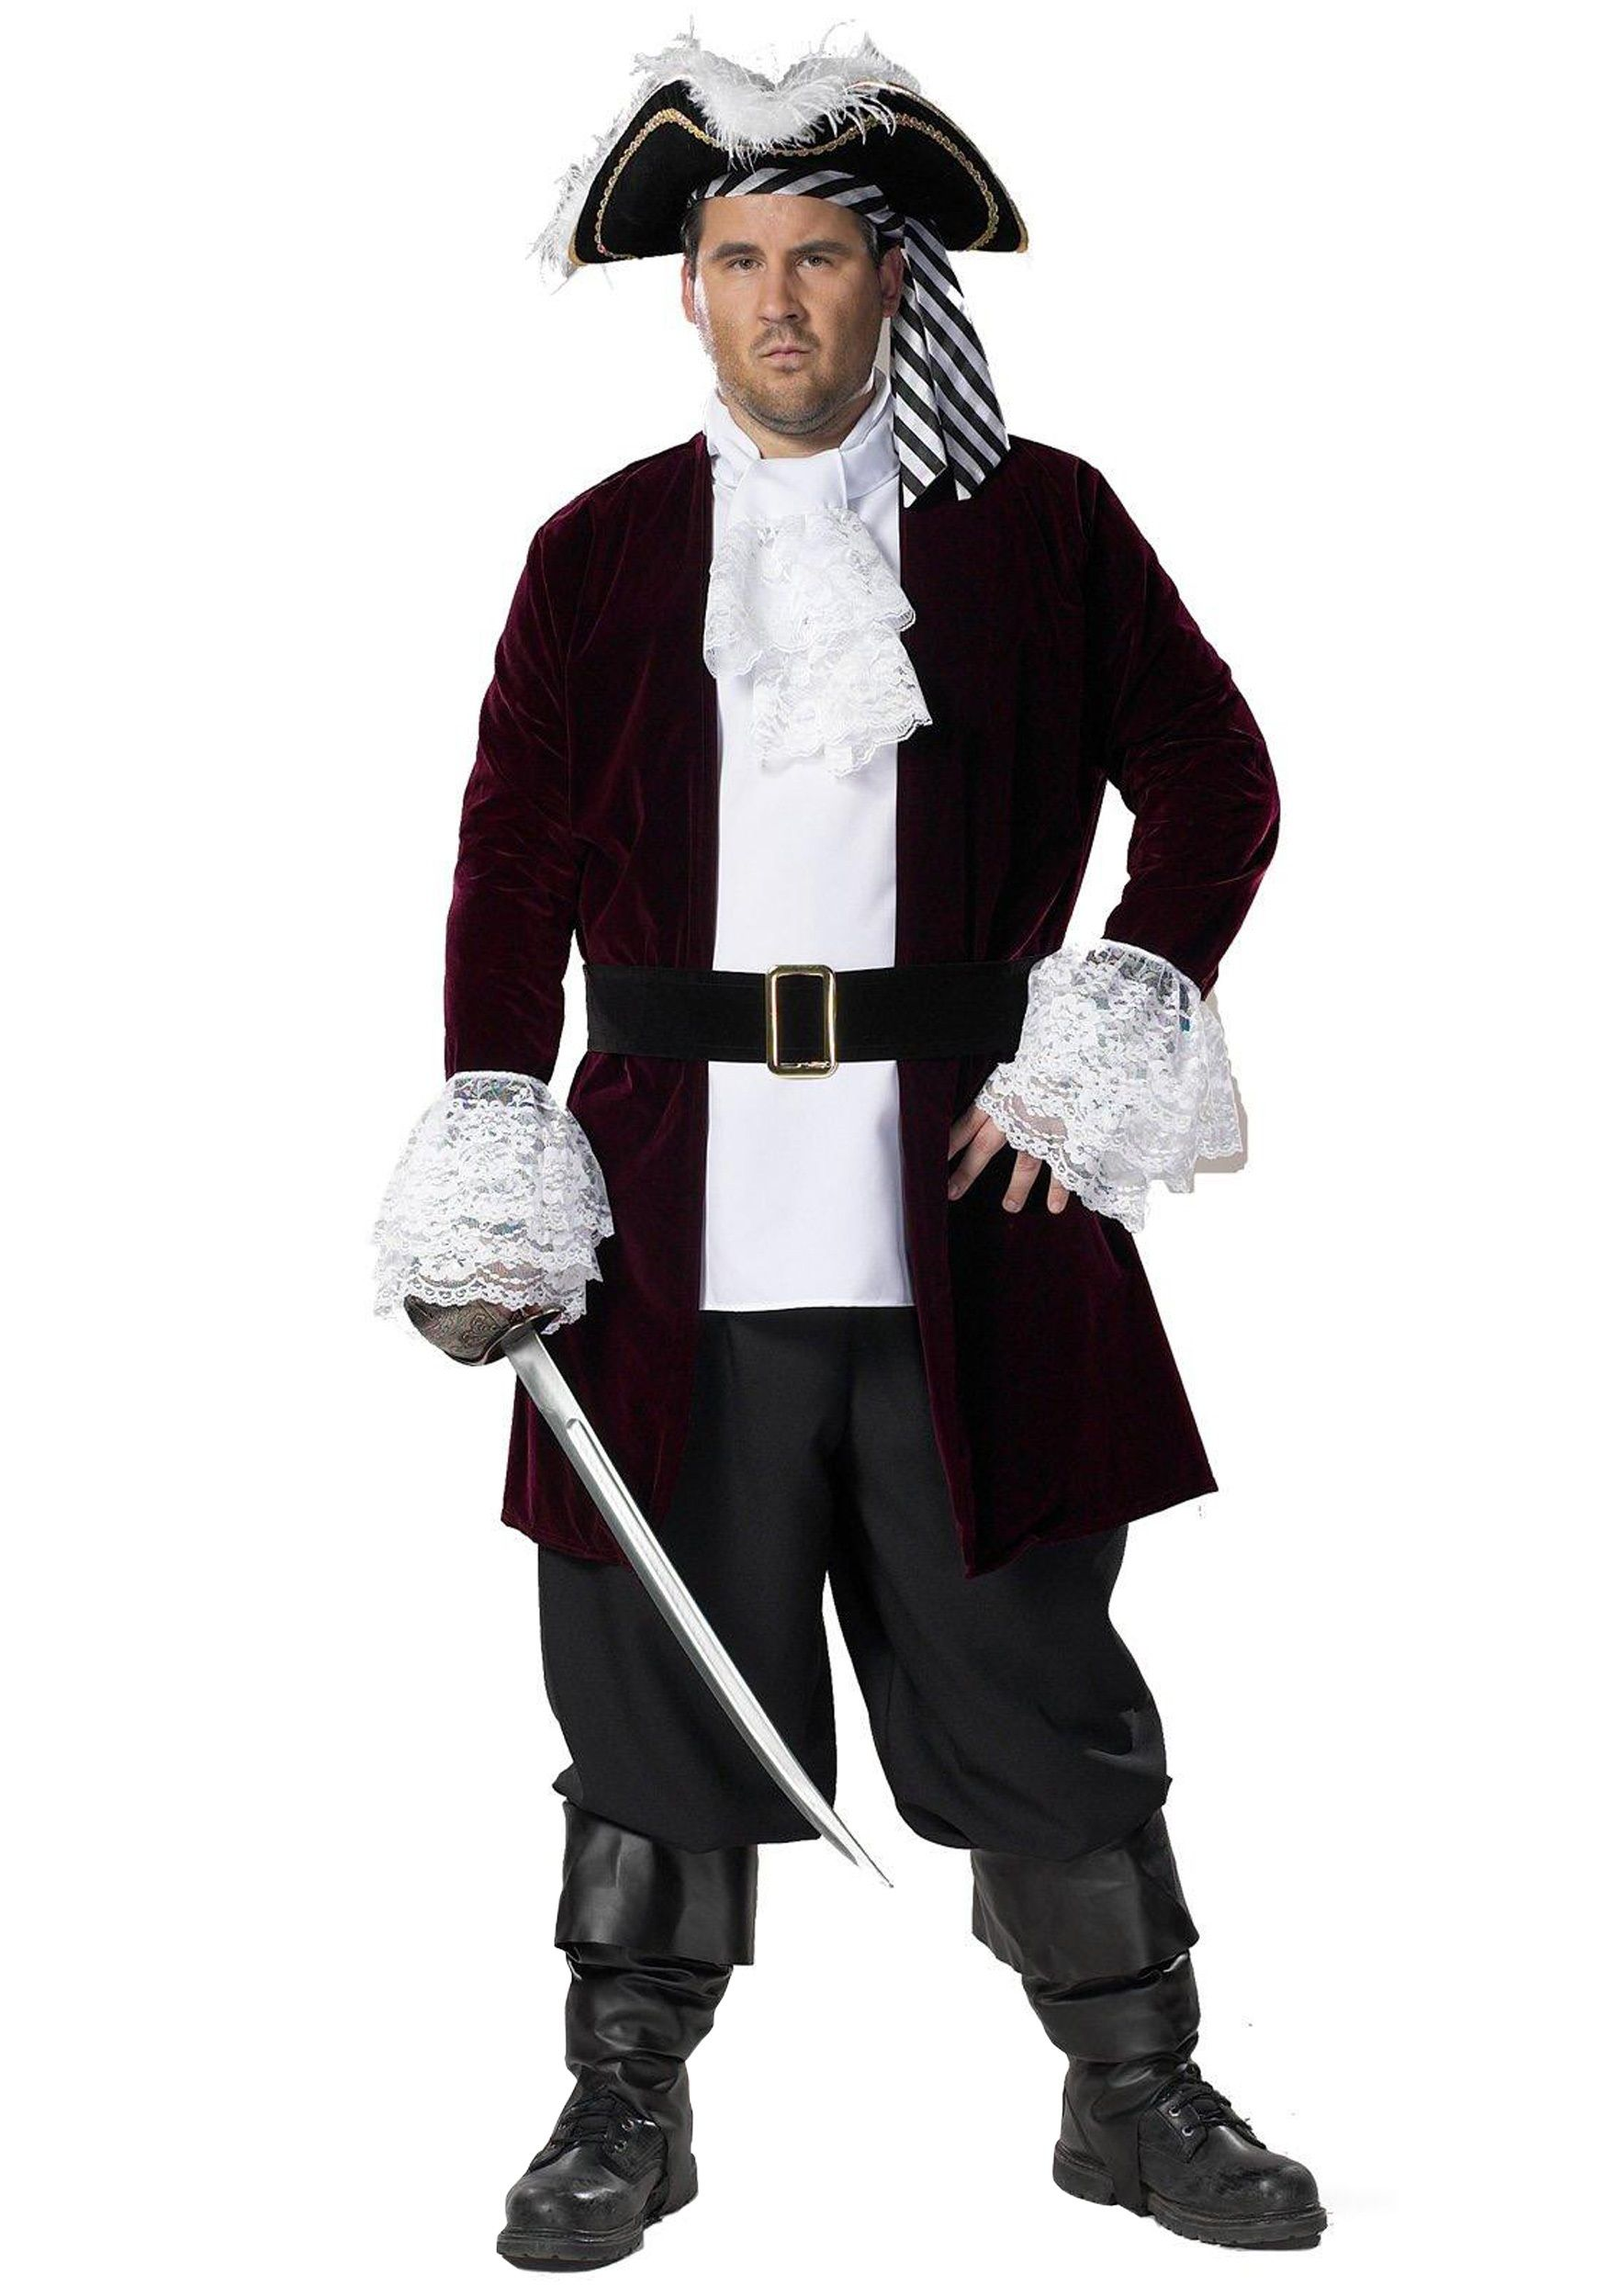 adult male pirate costumes pirate costume ideas authentic pirate costumes mens plus size pirate - Halloween Pirate Costume Ideas